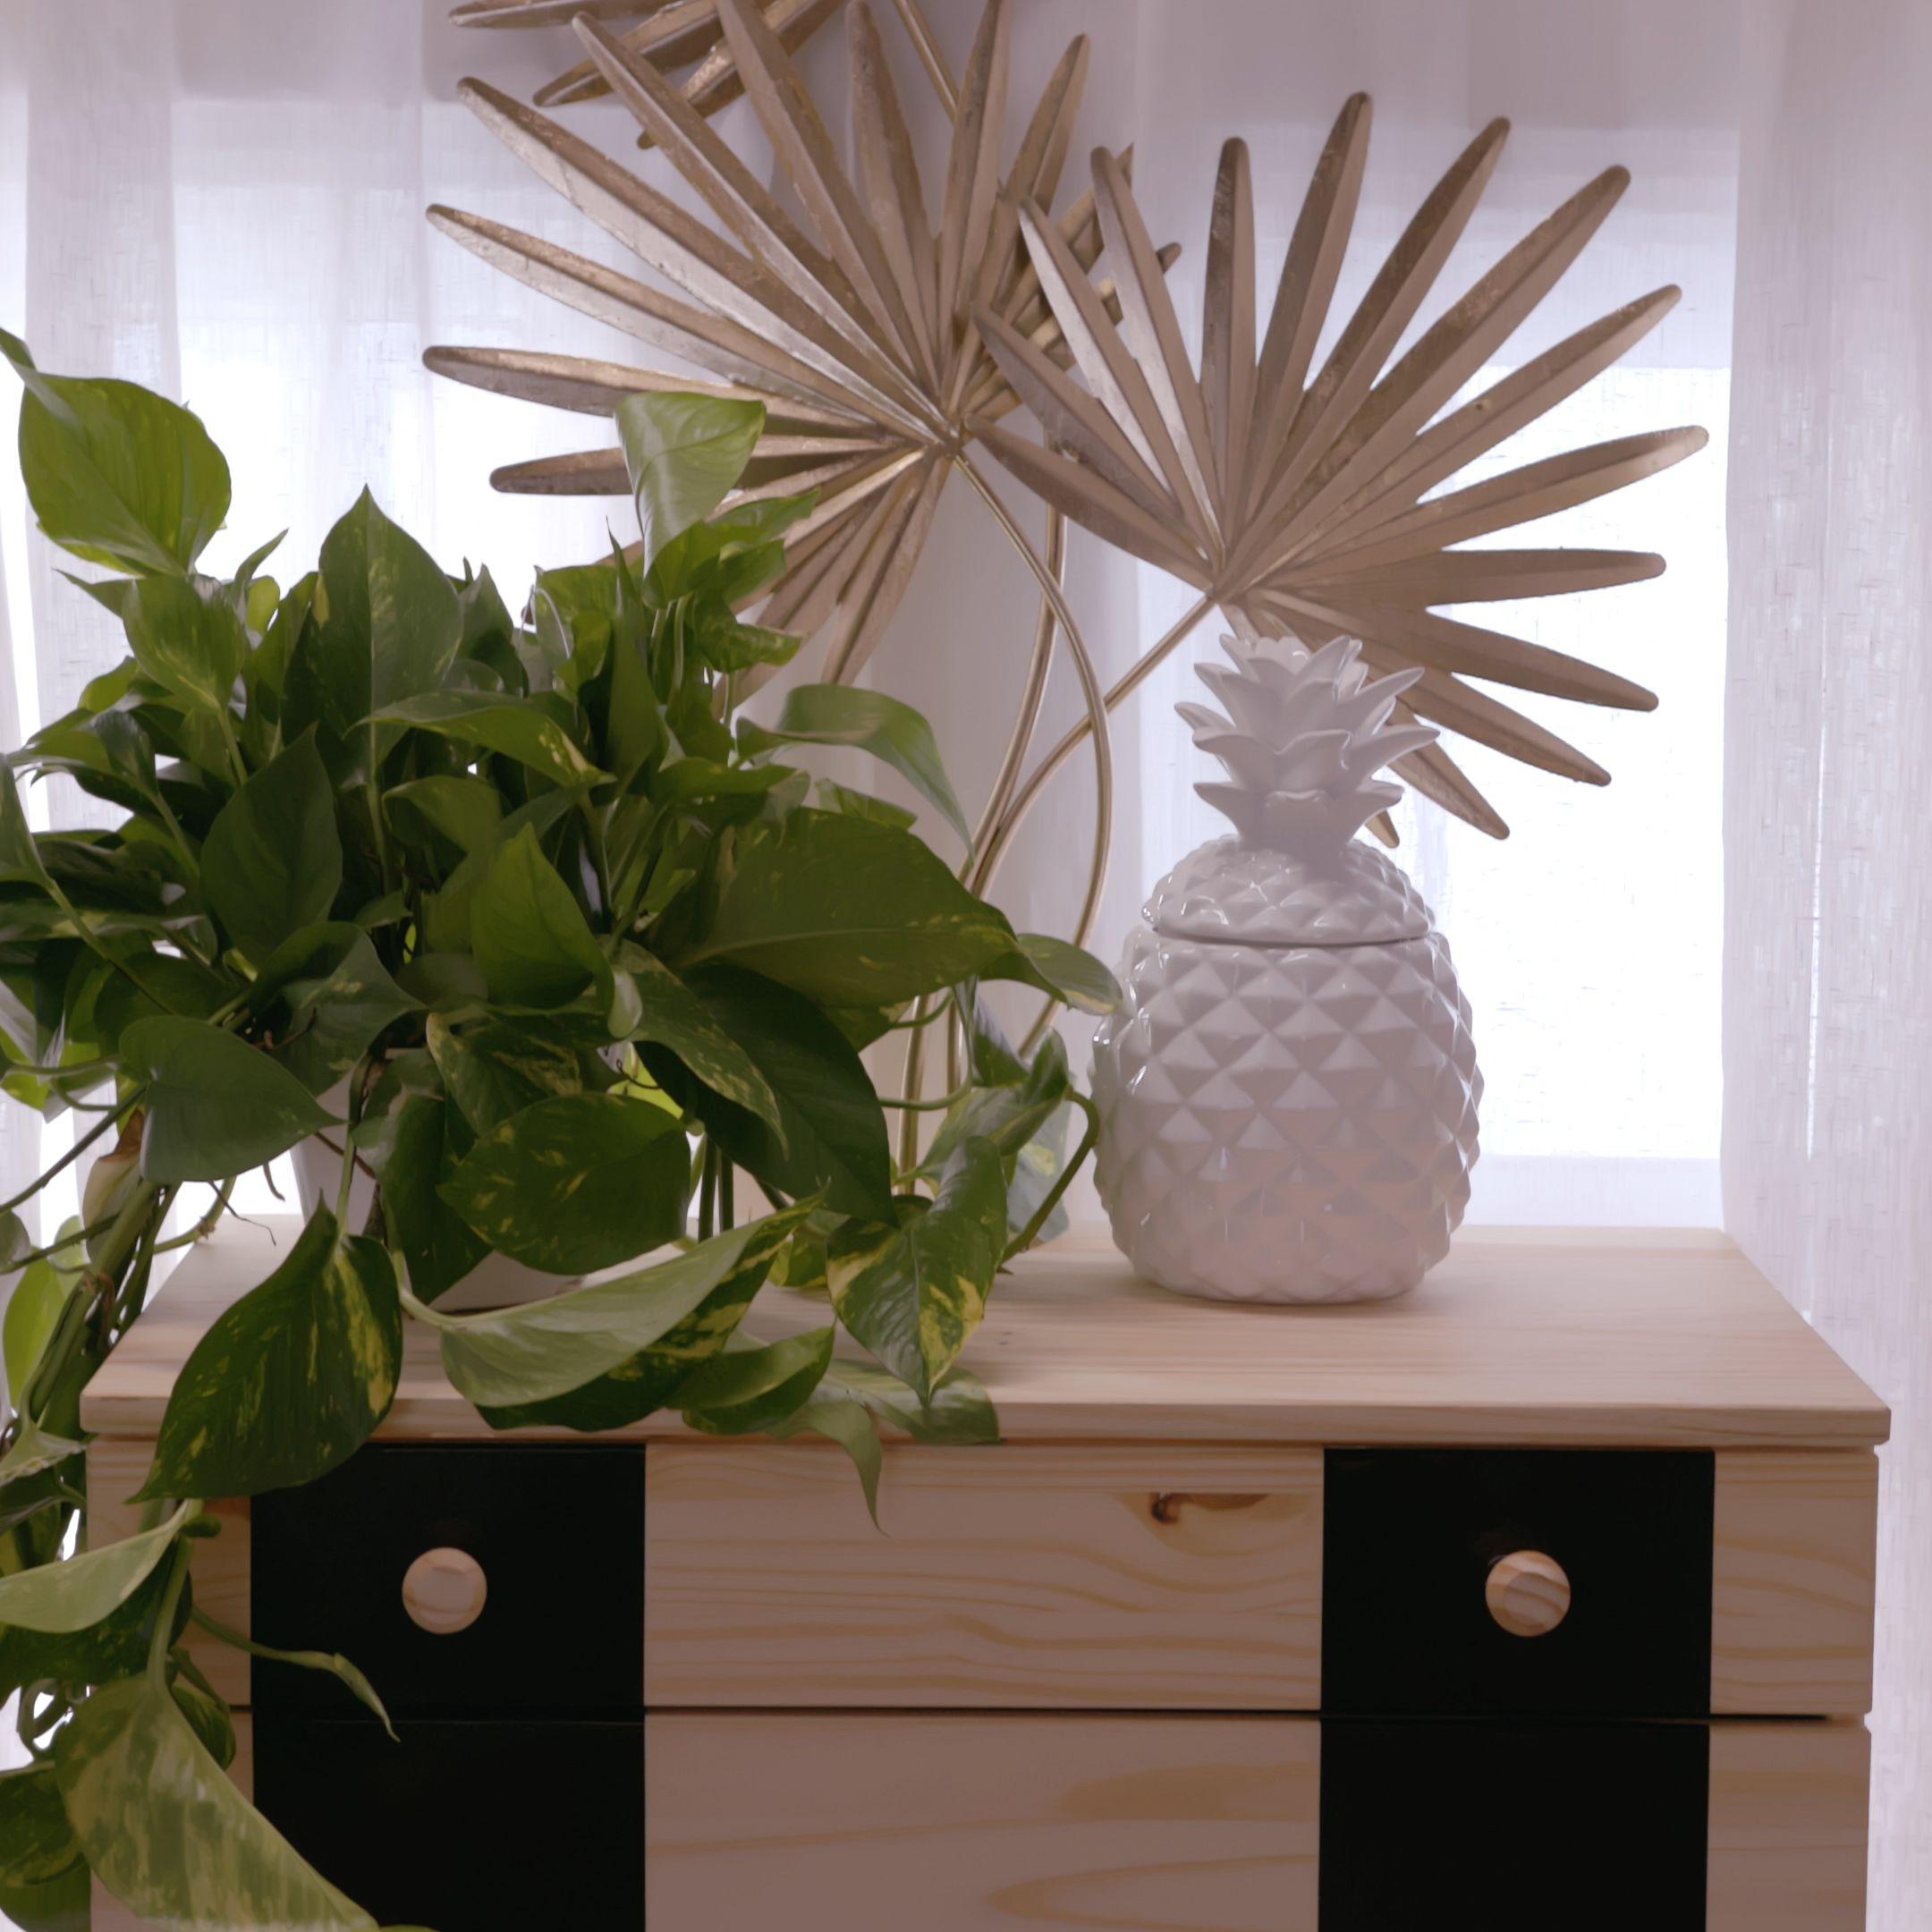 Customizing Dorm Room Furniture images